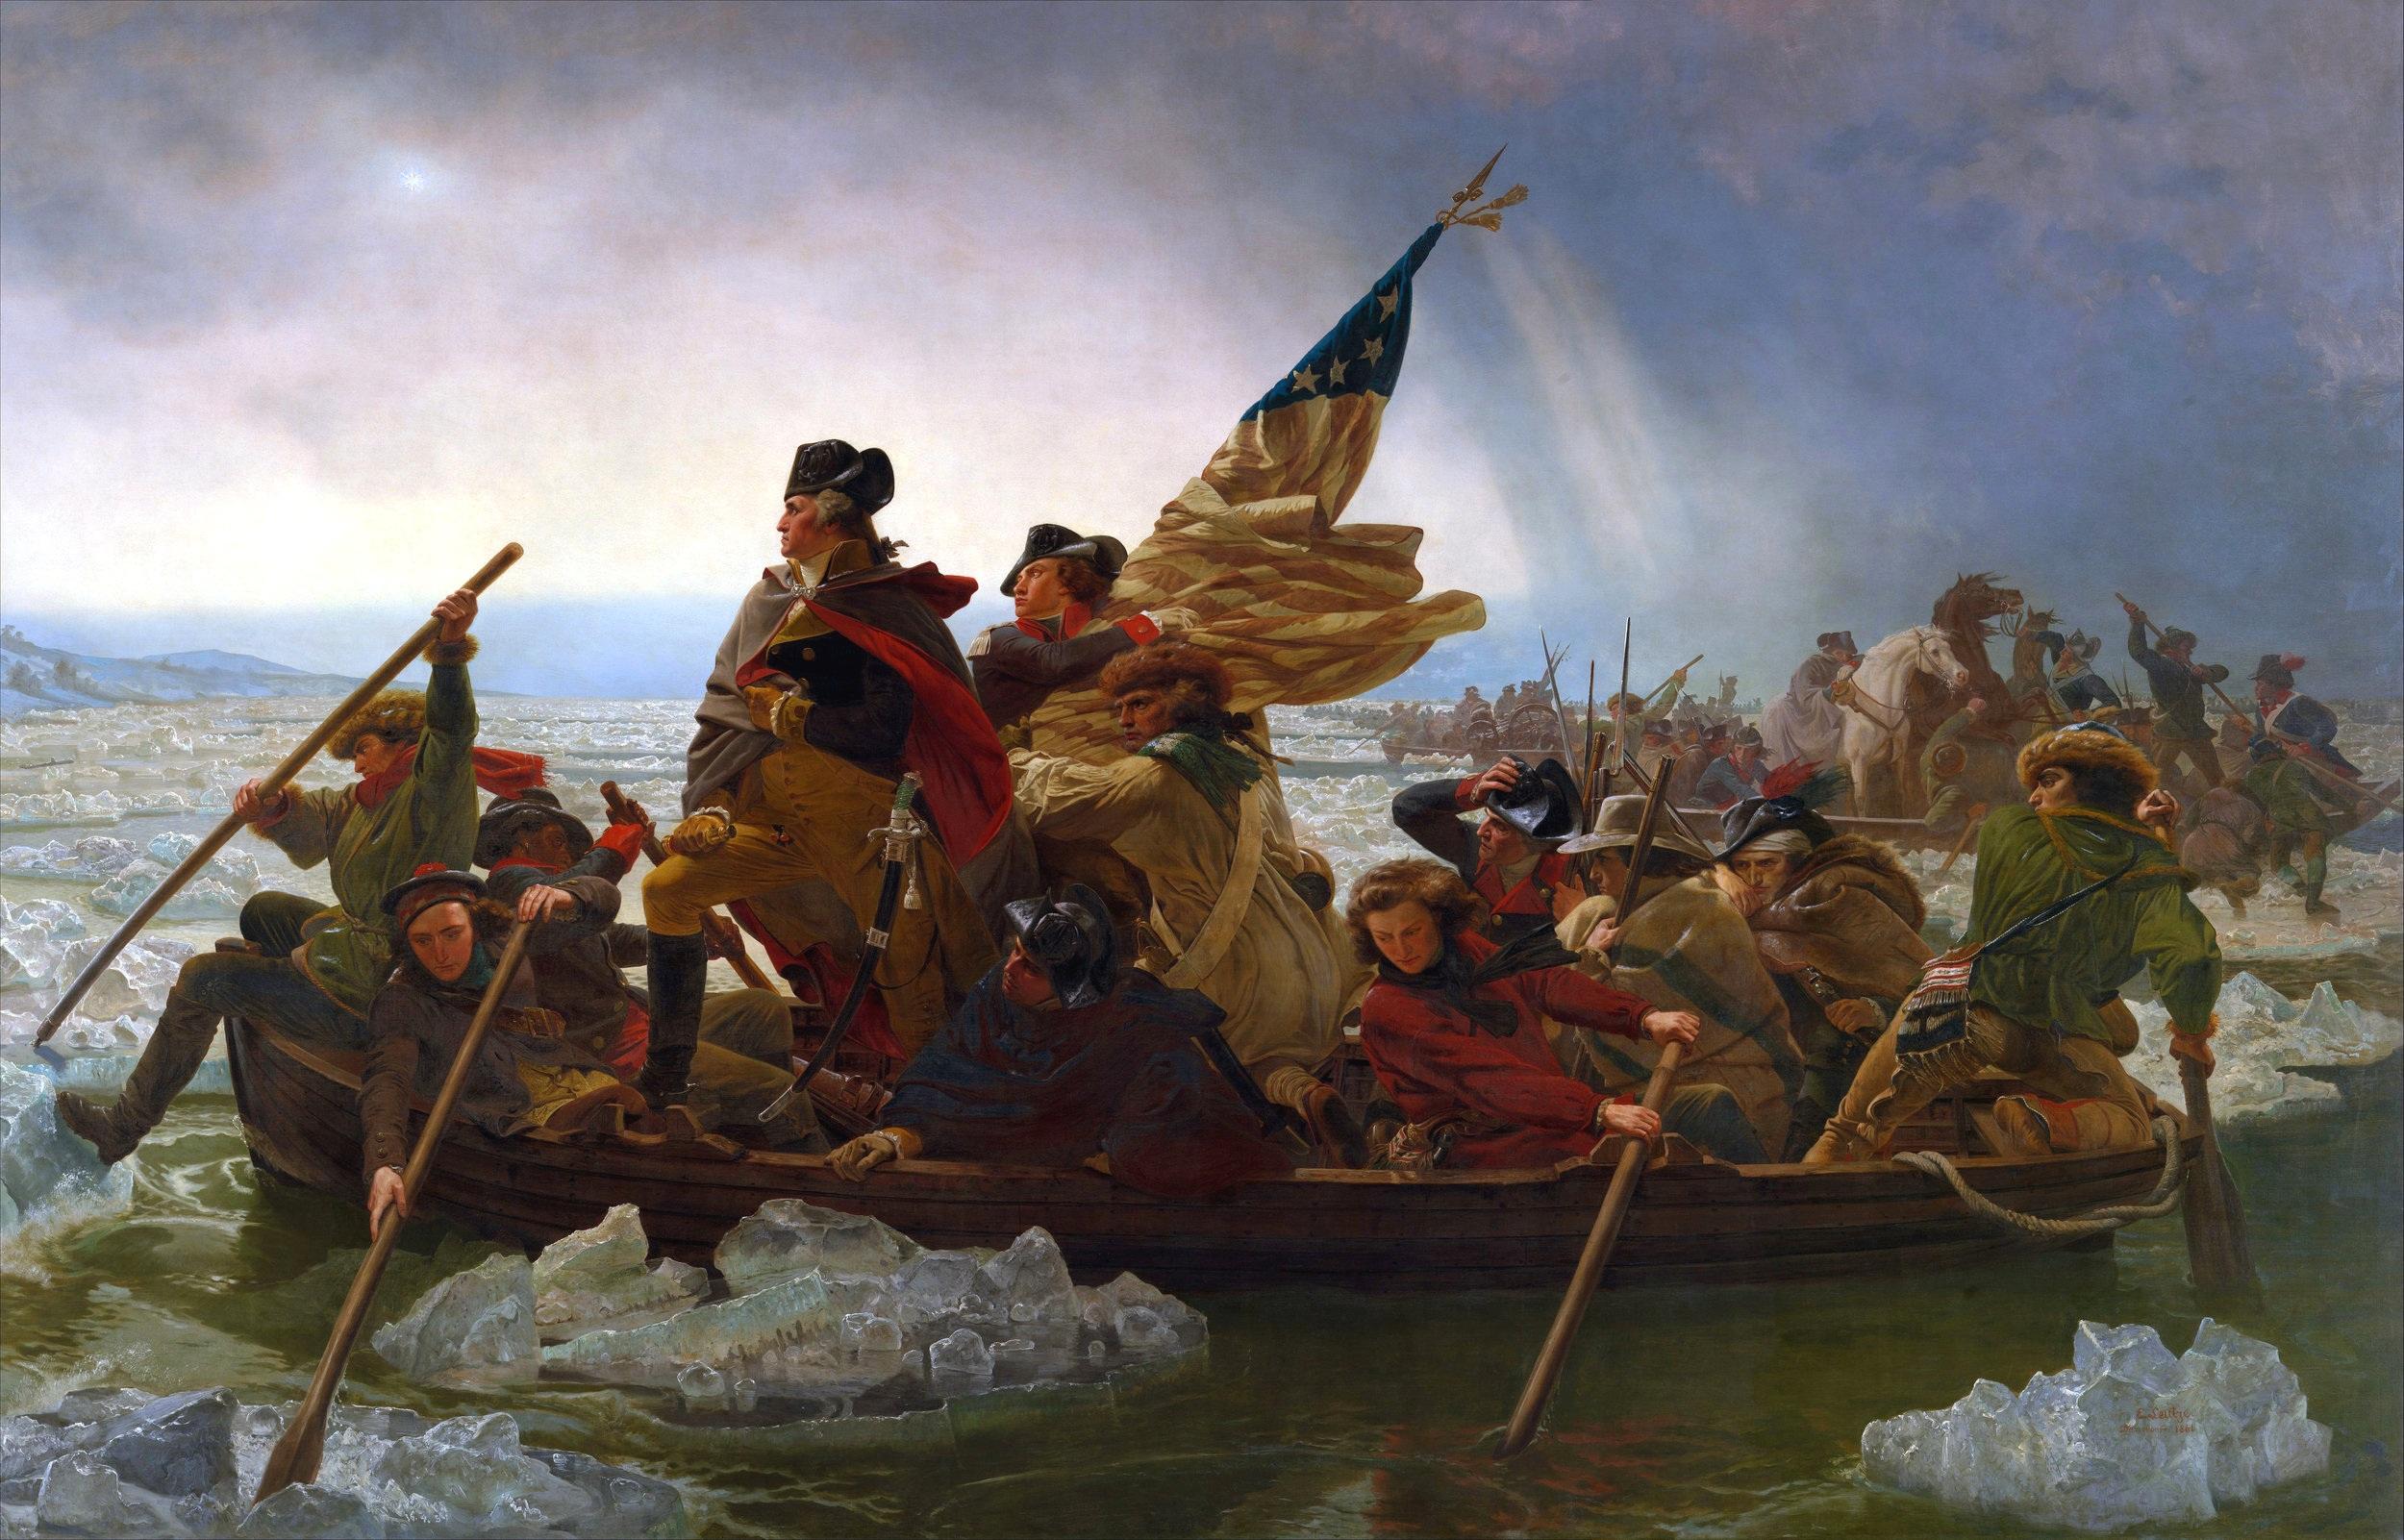 Washington_Crossing_the_Delaware_by_Emanuel_Leutze%2C_MMA-NYC%2C_1851.jpg